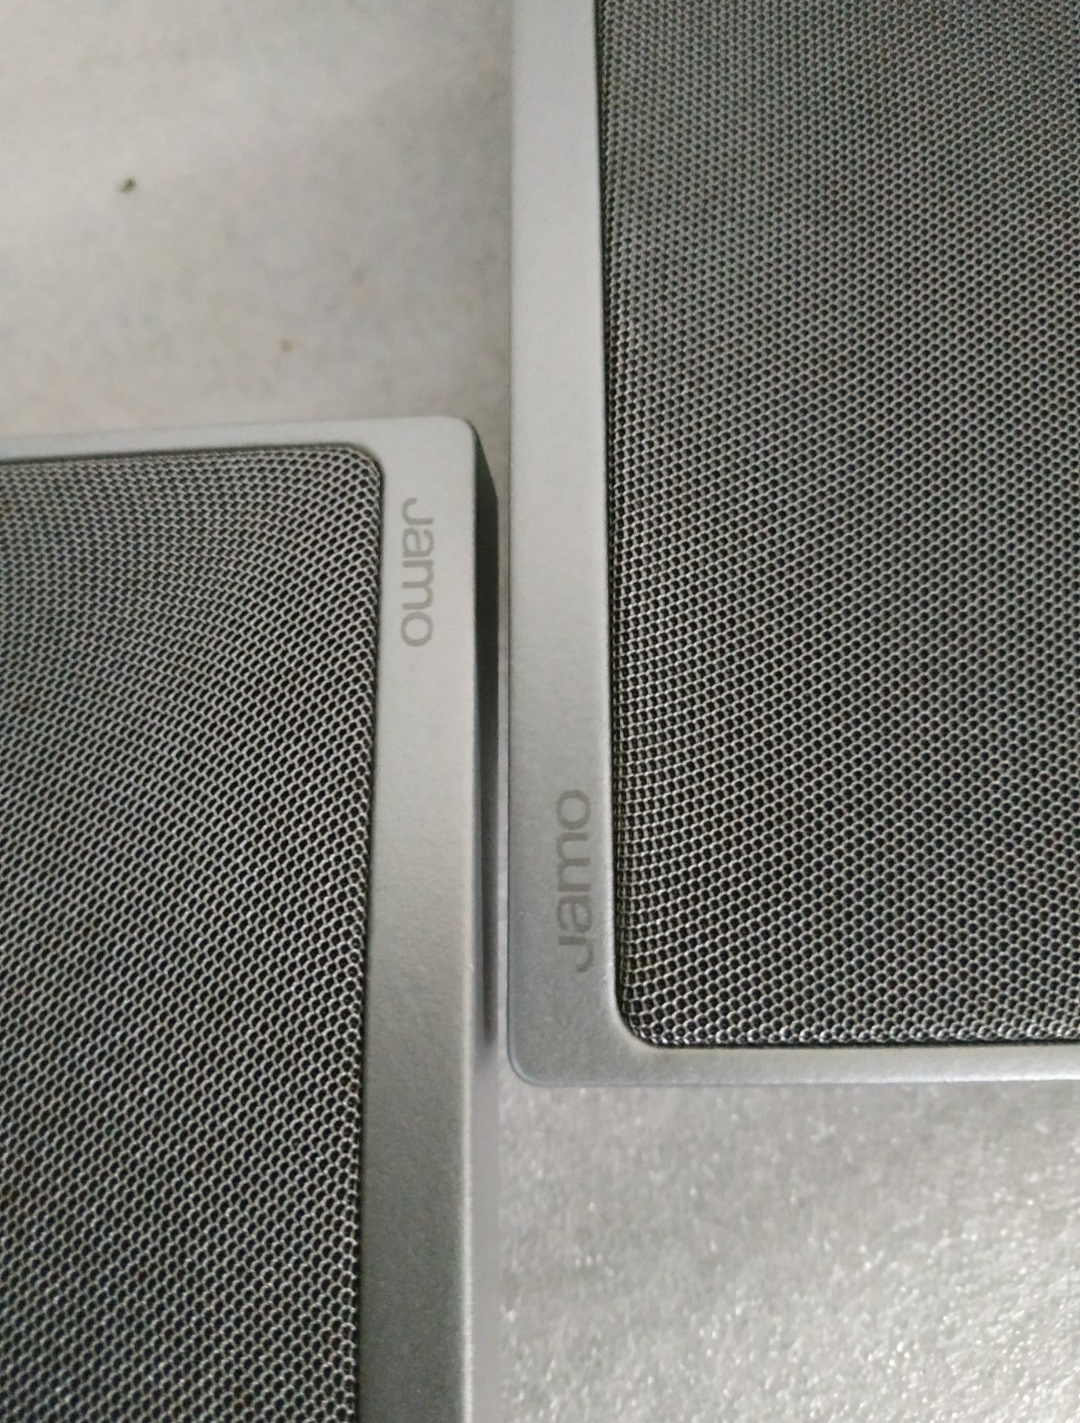 Jamo A500 flat speakers IMG_20190605_123114